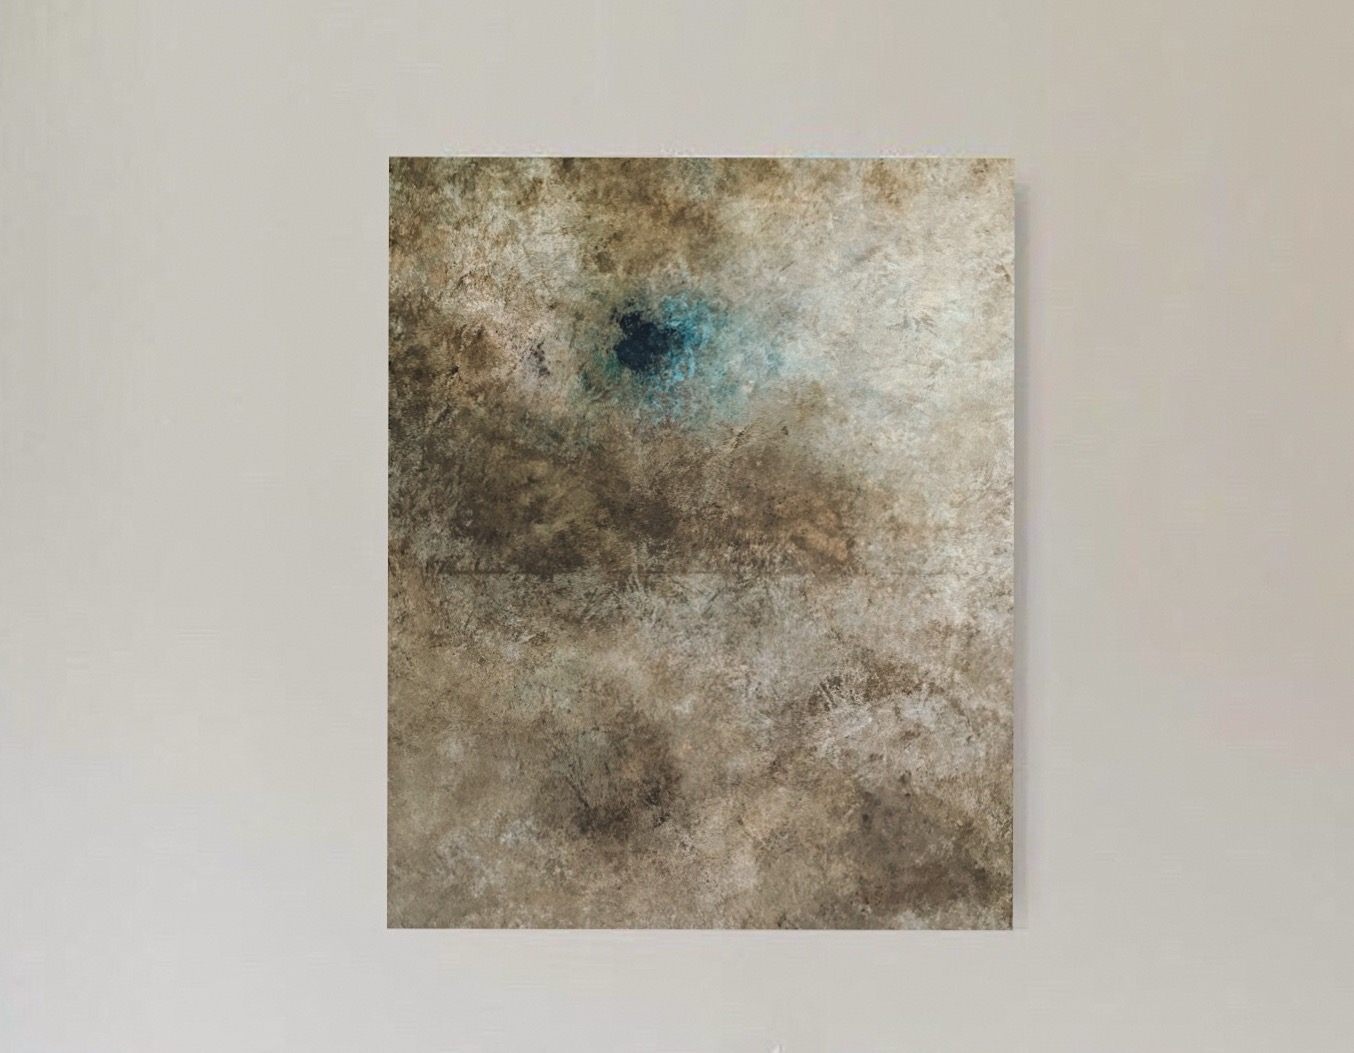 Marine Bonzom - Artiste Peintre Biarritz - Home - Tropismes